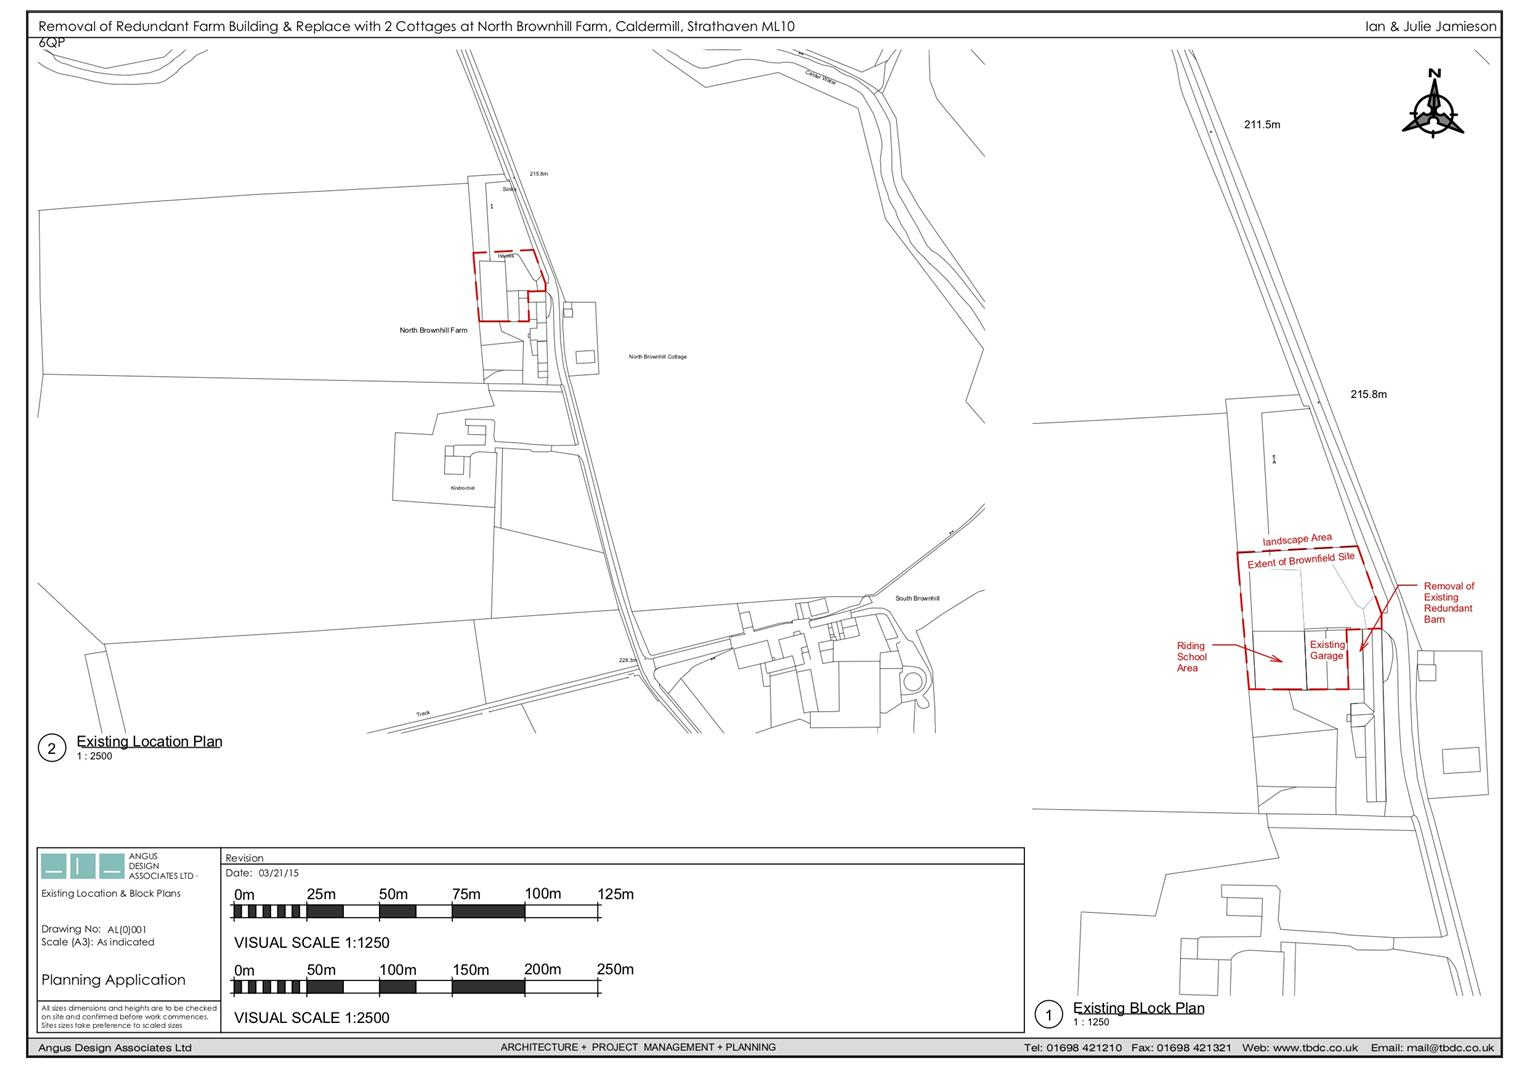 Existing Location Plan